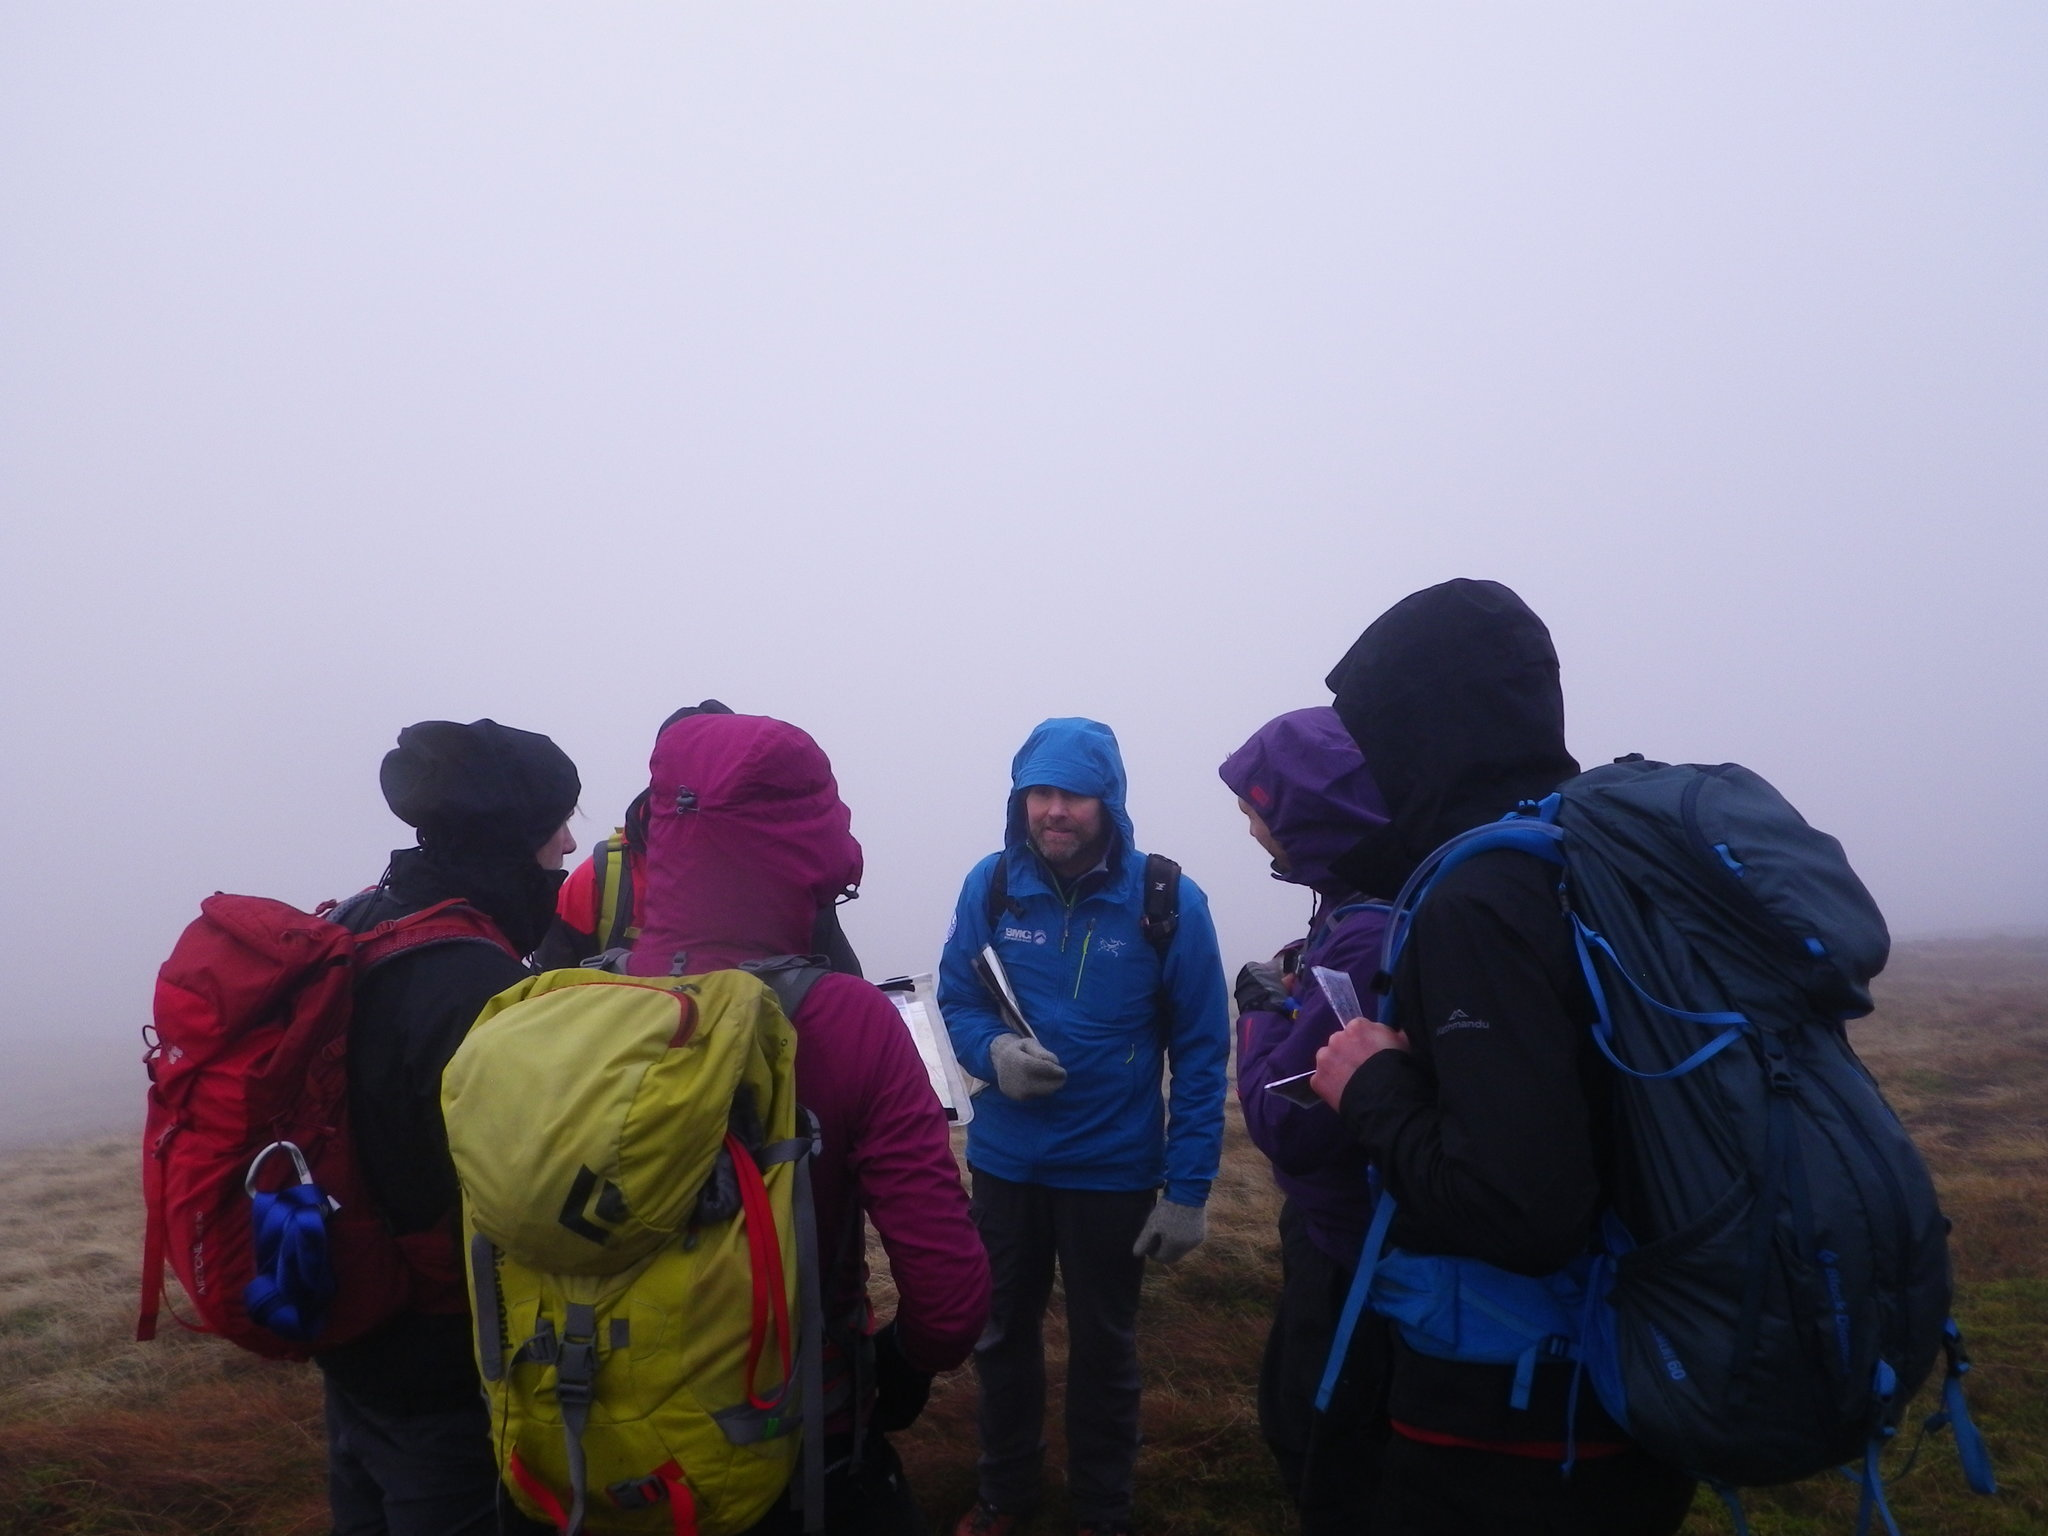 MLA 17.01 Mountain Leader training 02 resized.jpg